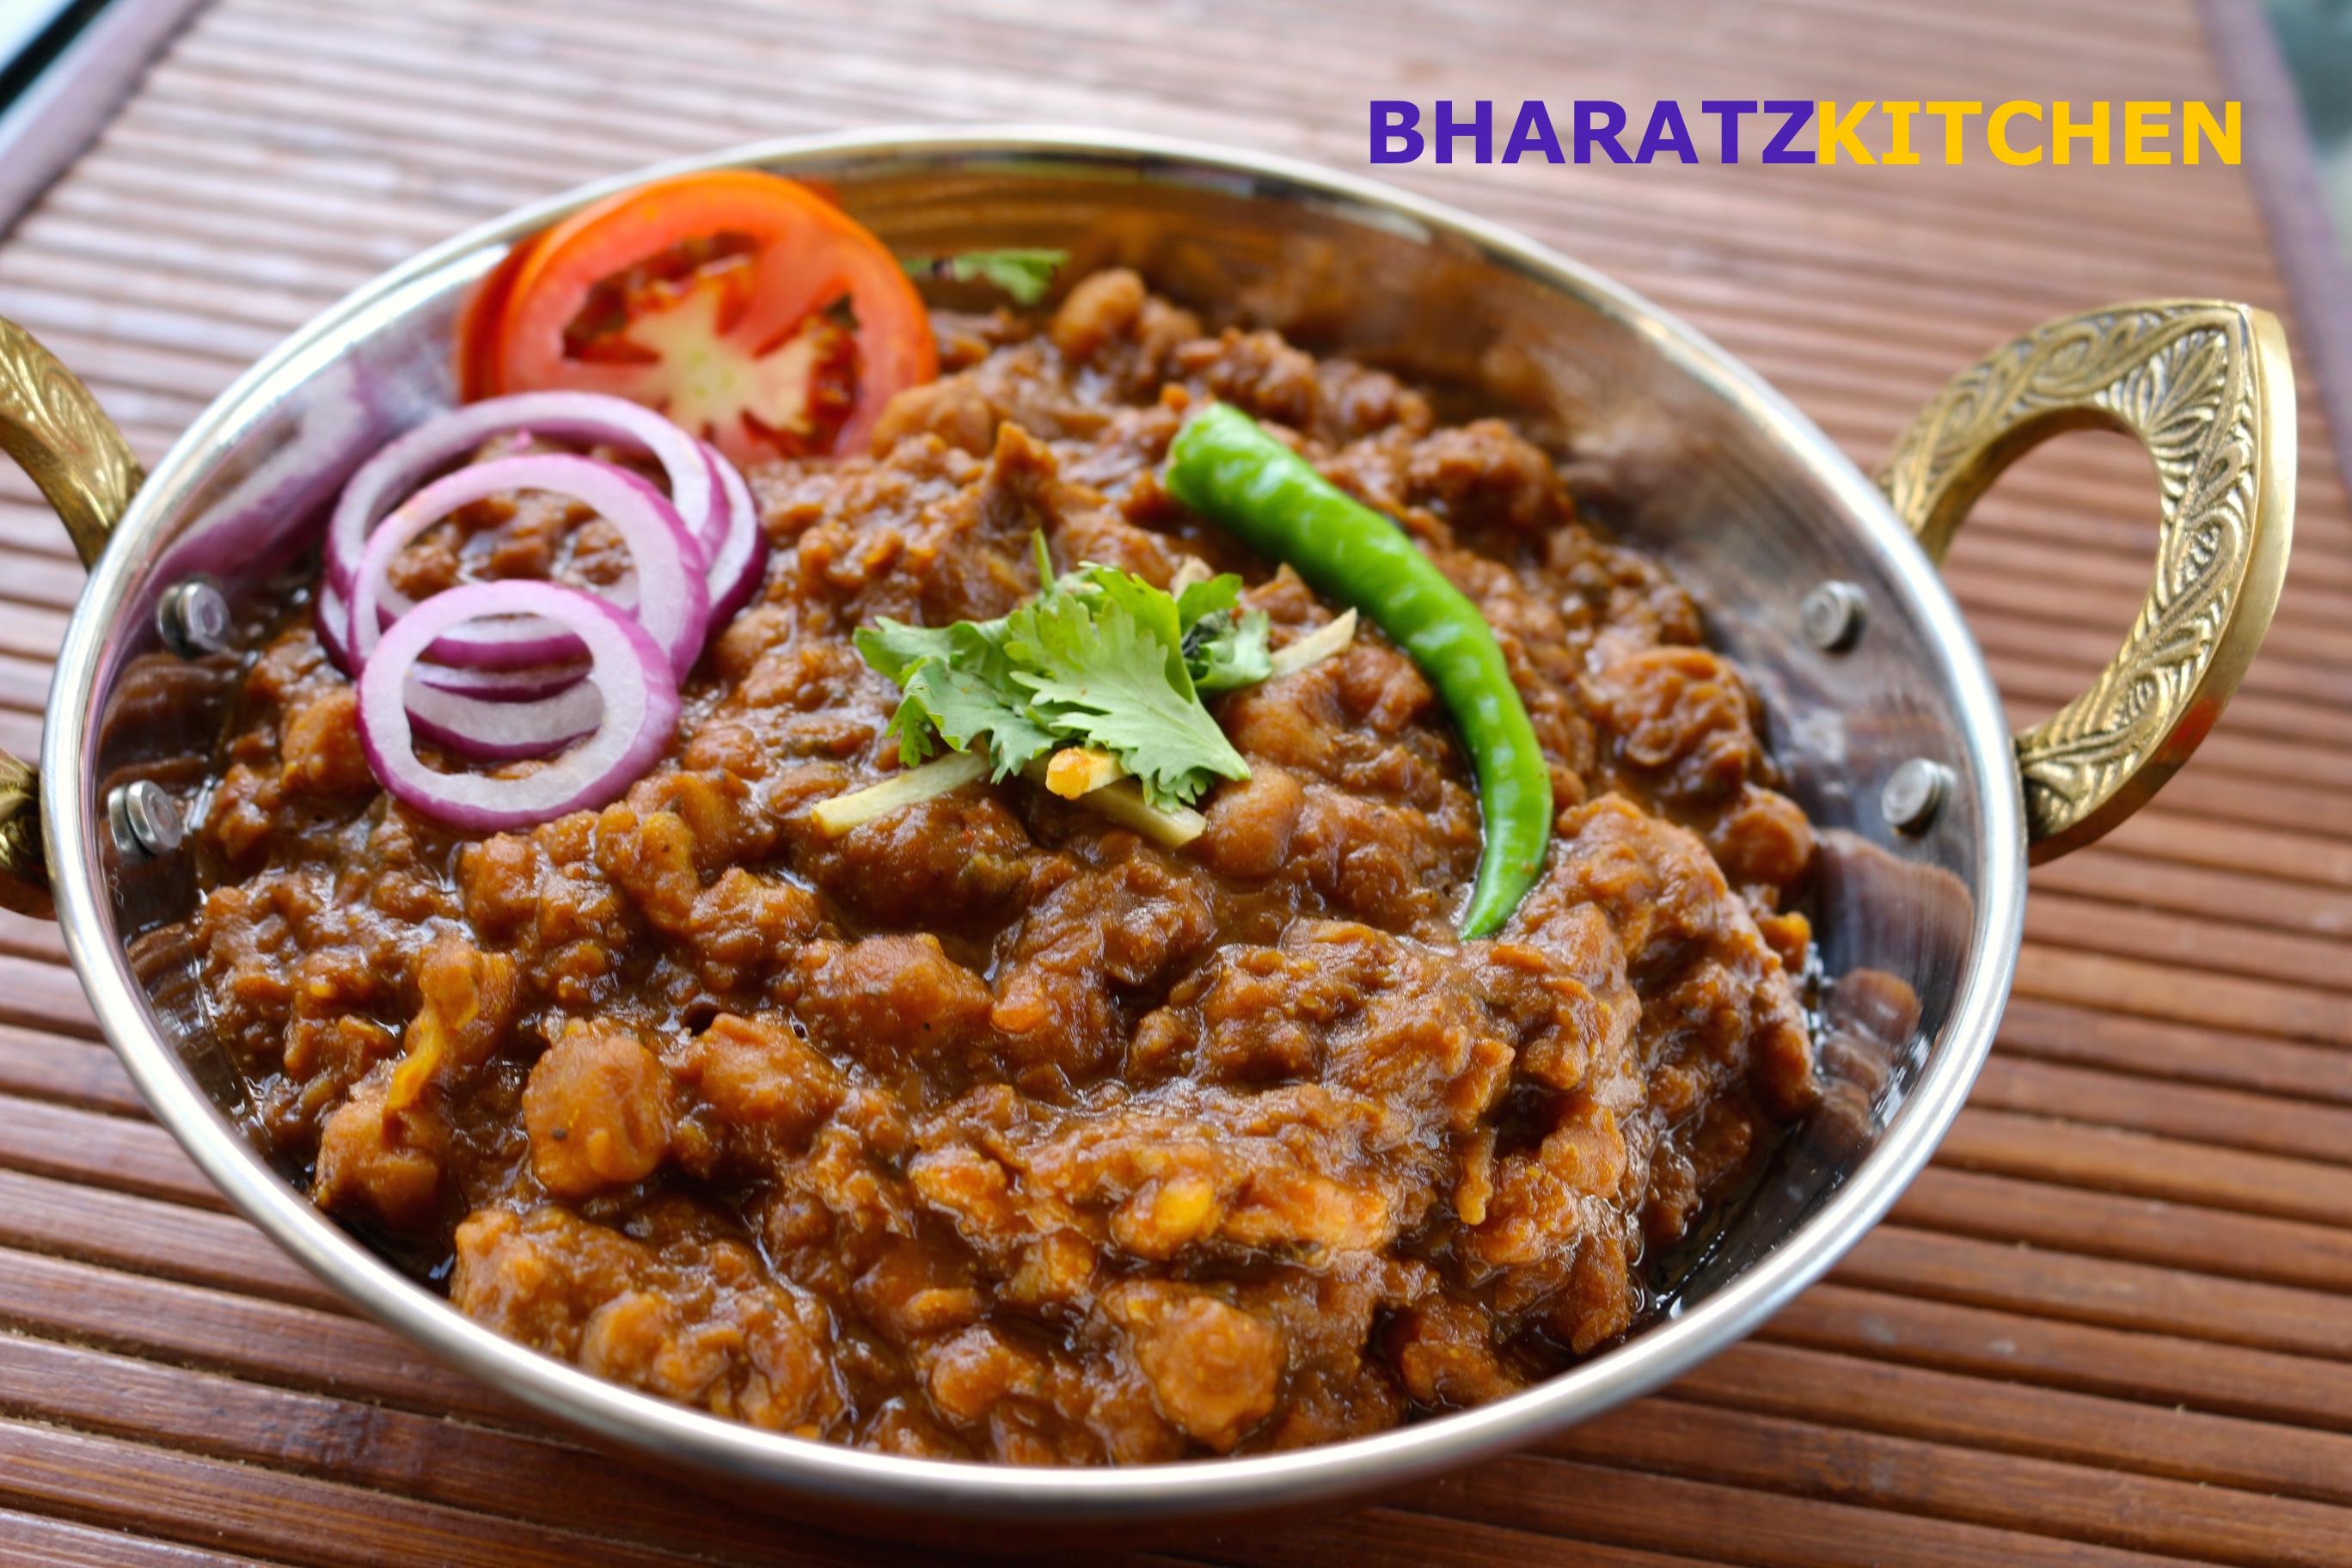 Punjabi choley recipe bharatzkitchen perfect punjabi choley masala chana masala recipe type curries cuisine indian forumfinder Images